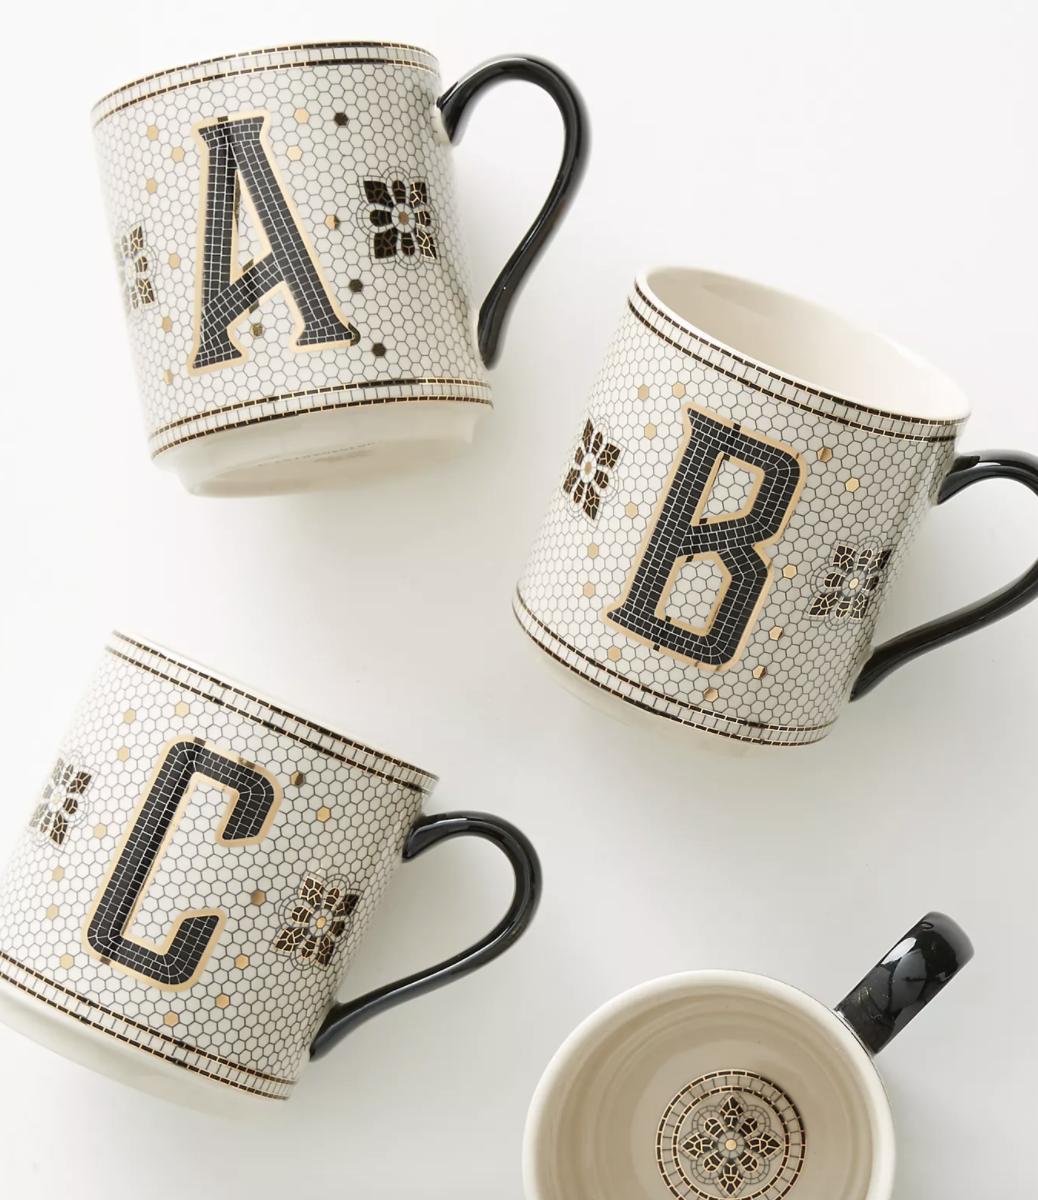 Anthropogie Mug With Initial